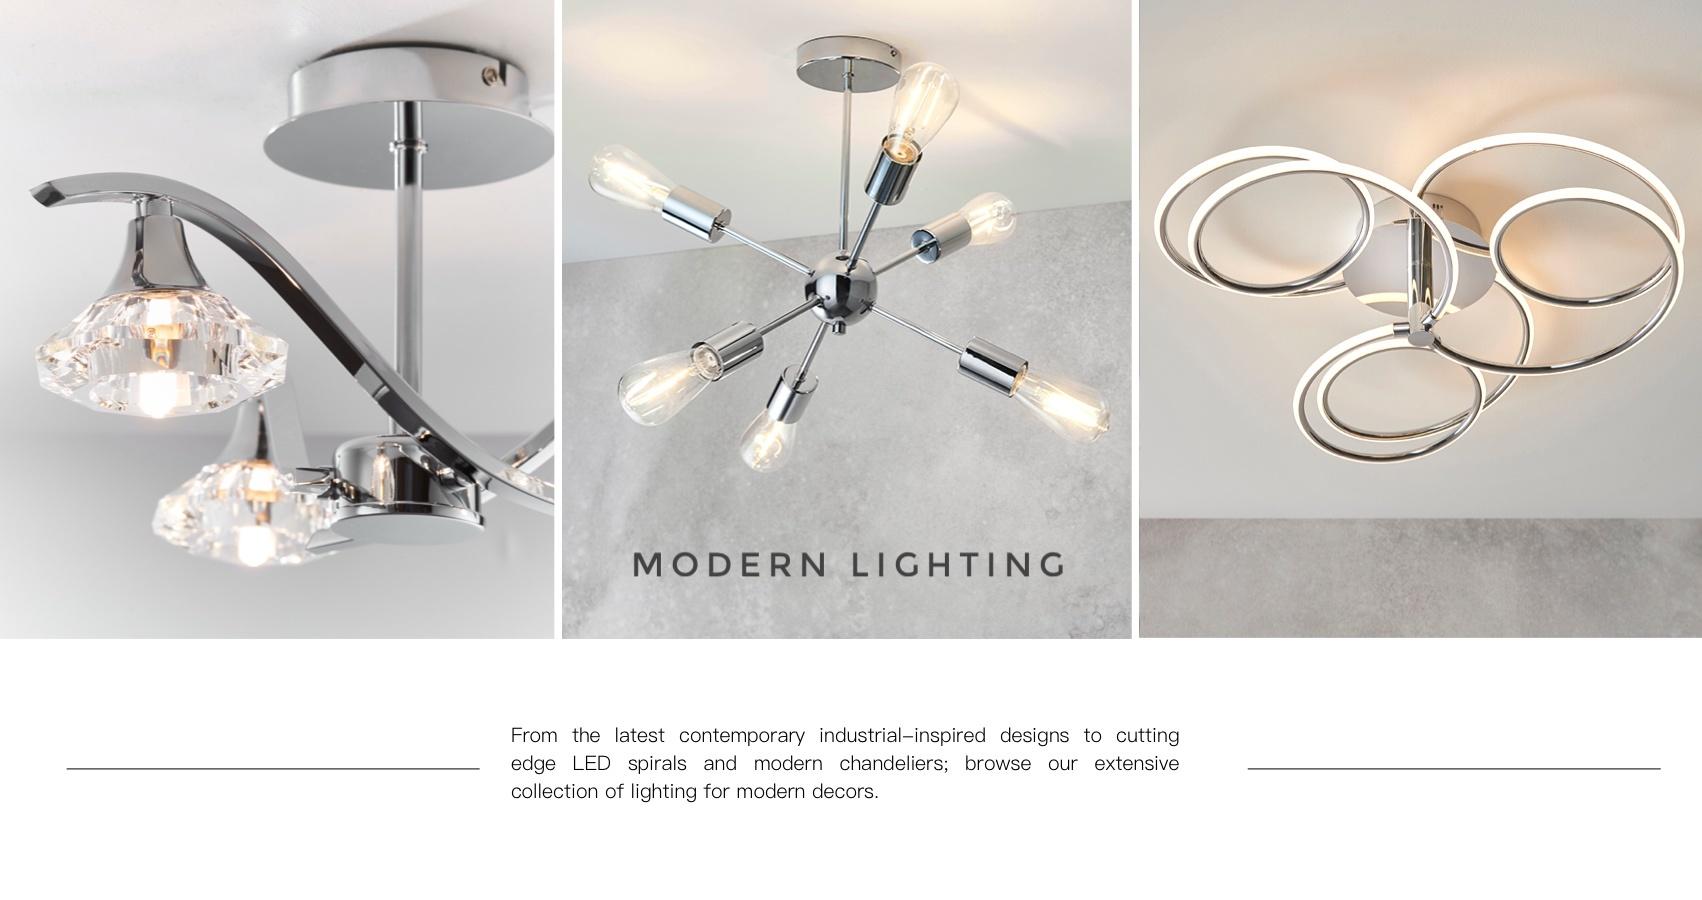 Modern Lighting